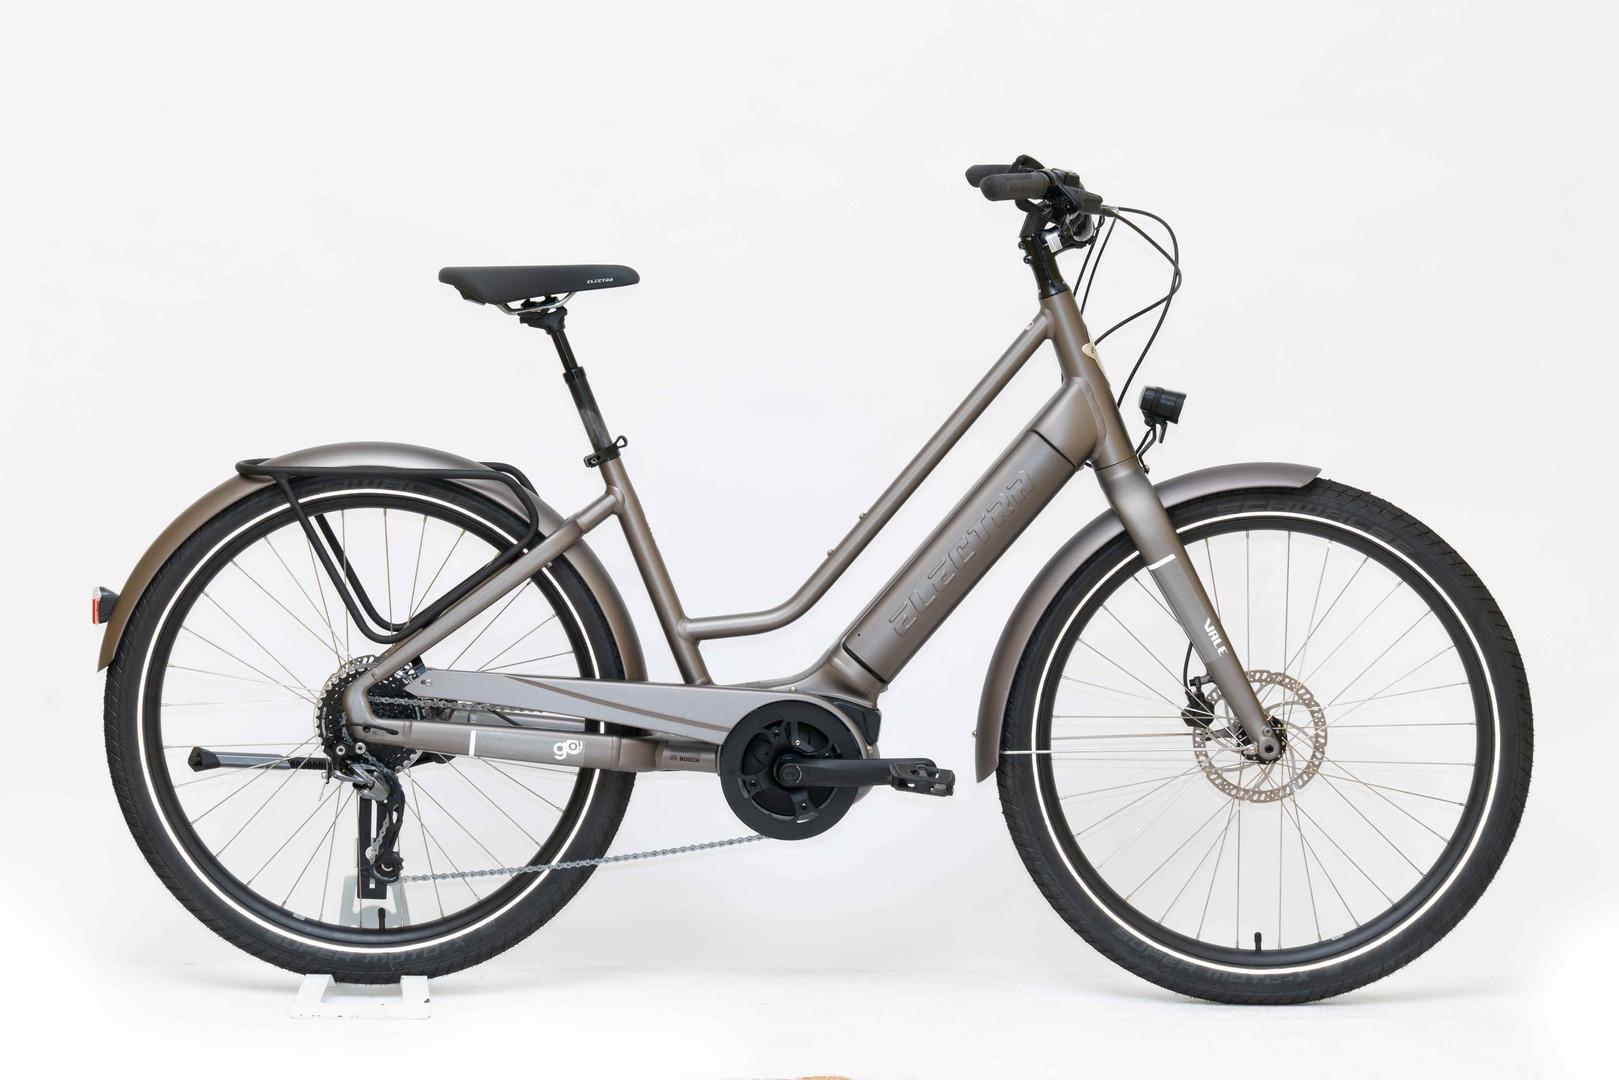 Fahrradladen_Pforzheim_Simoes_Bikes_101.